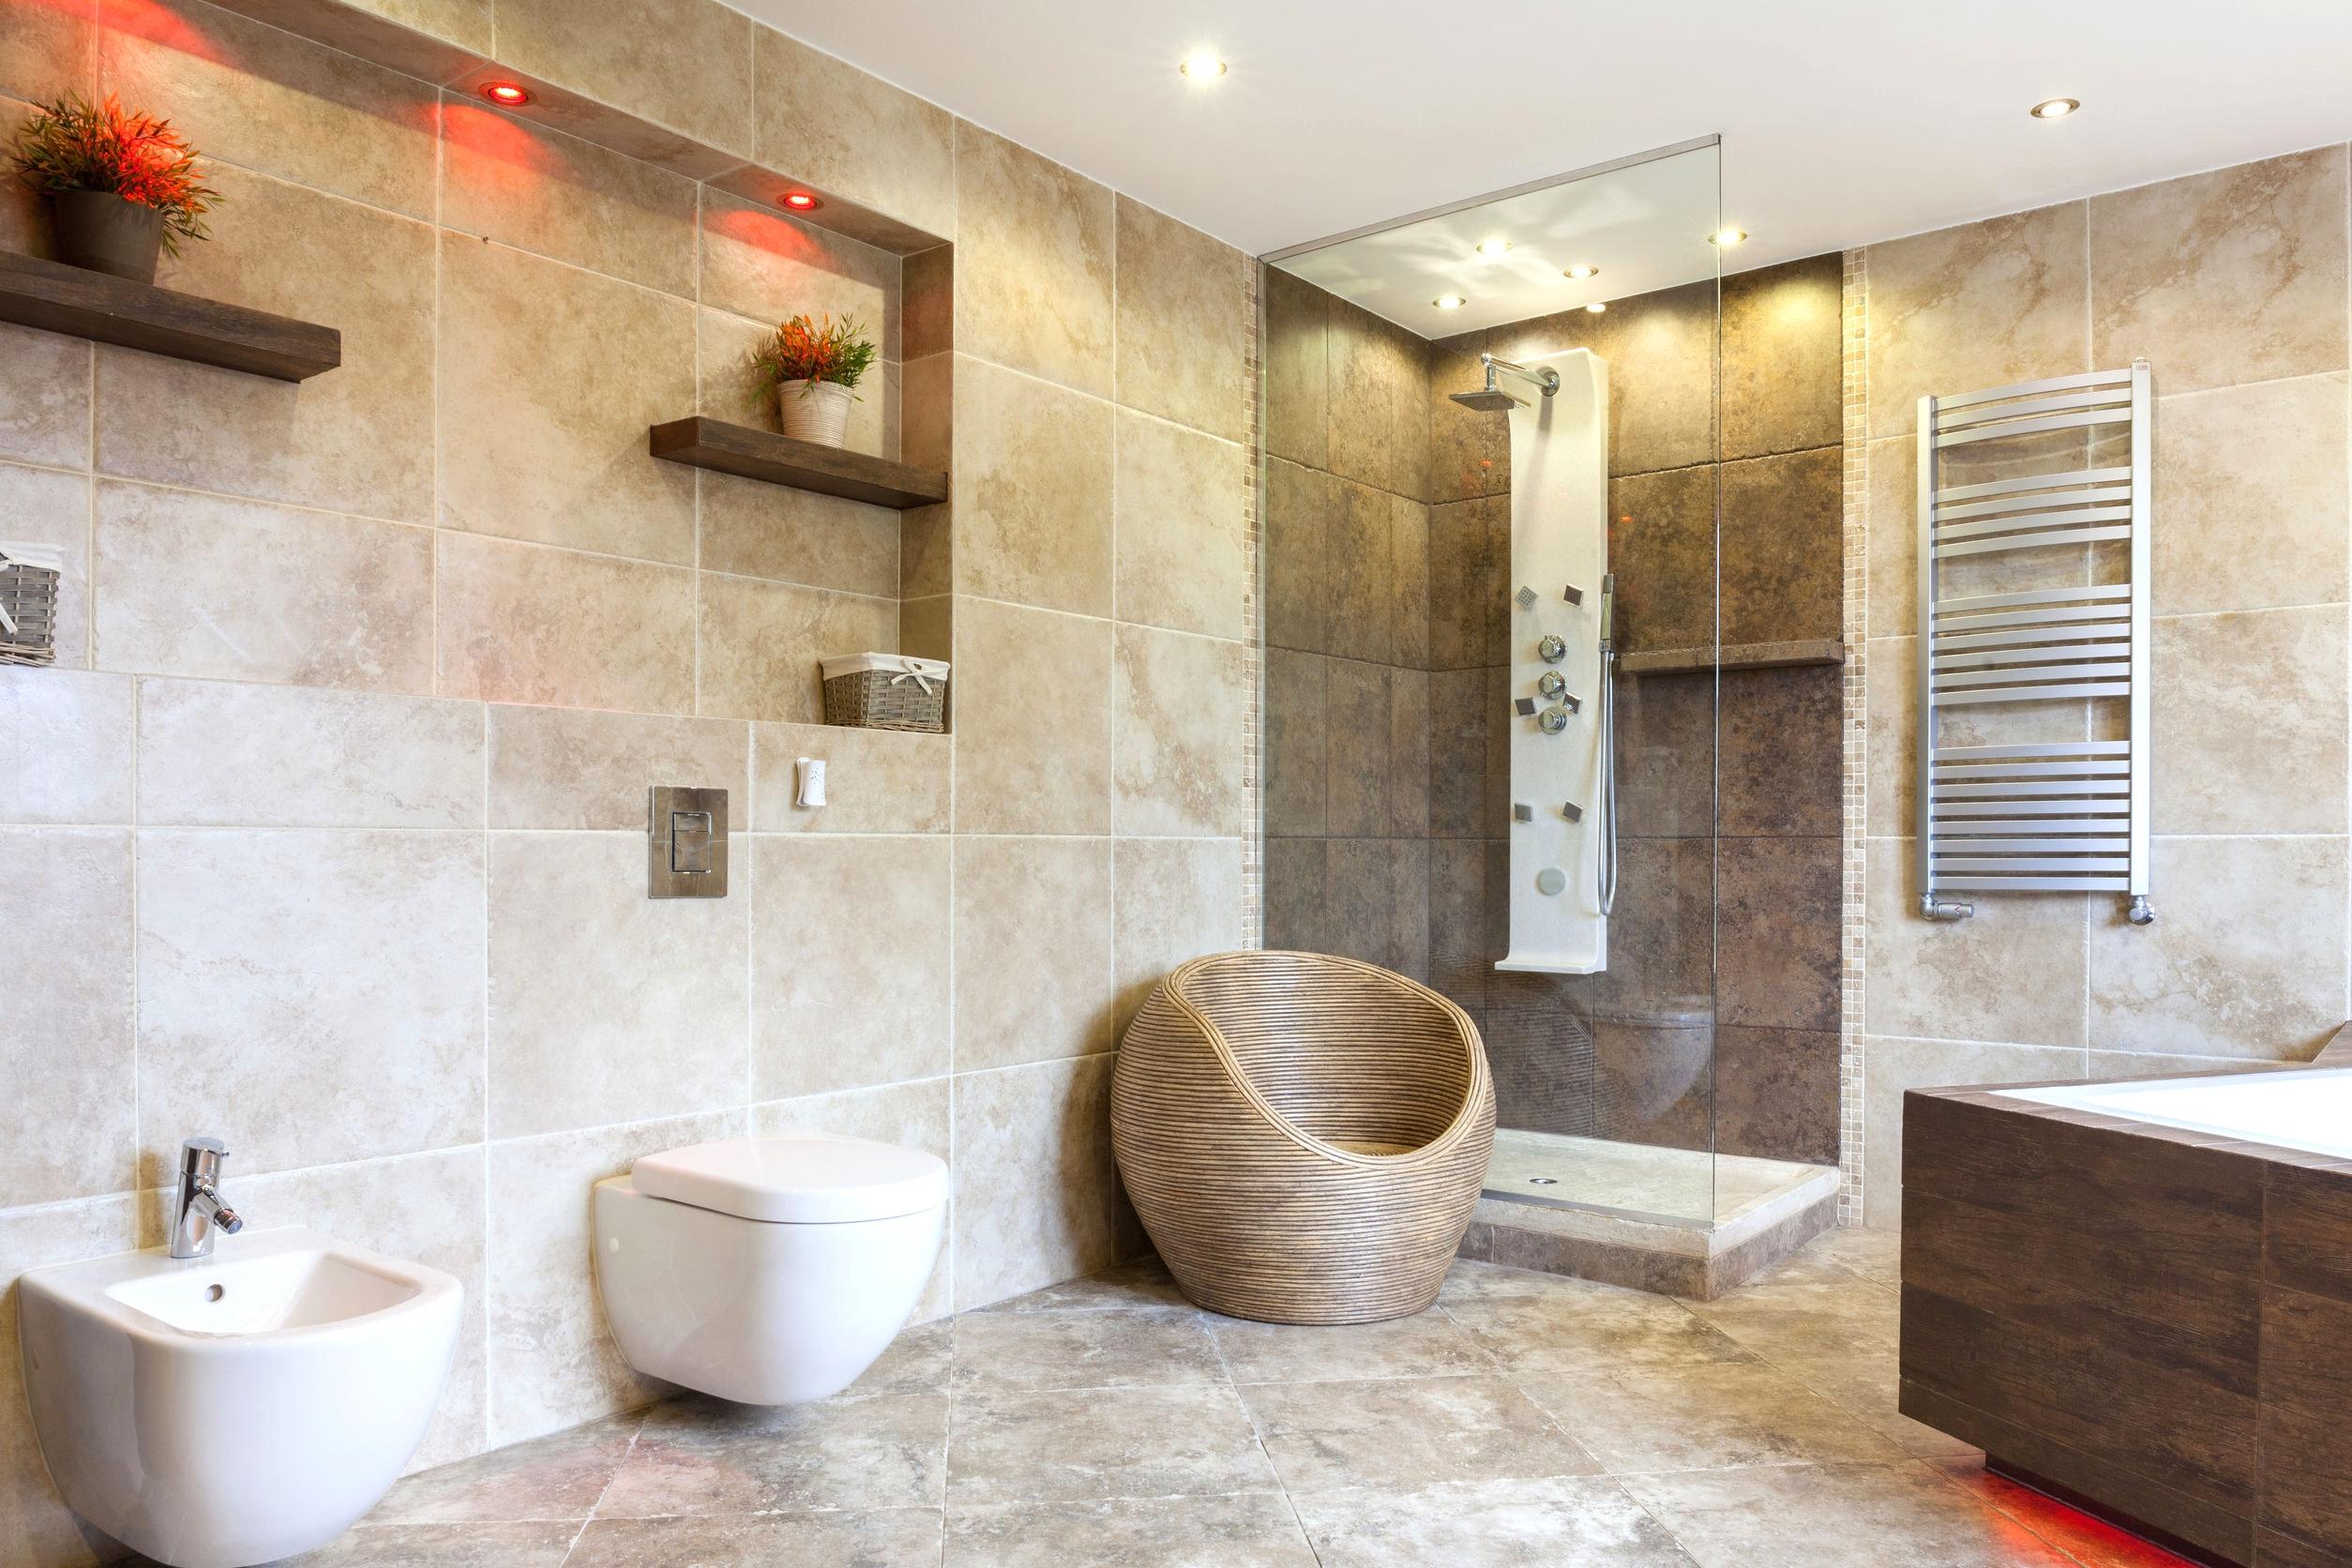 Бежевая ванная комната с каменной плиткой